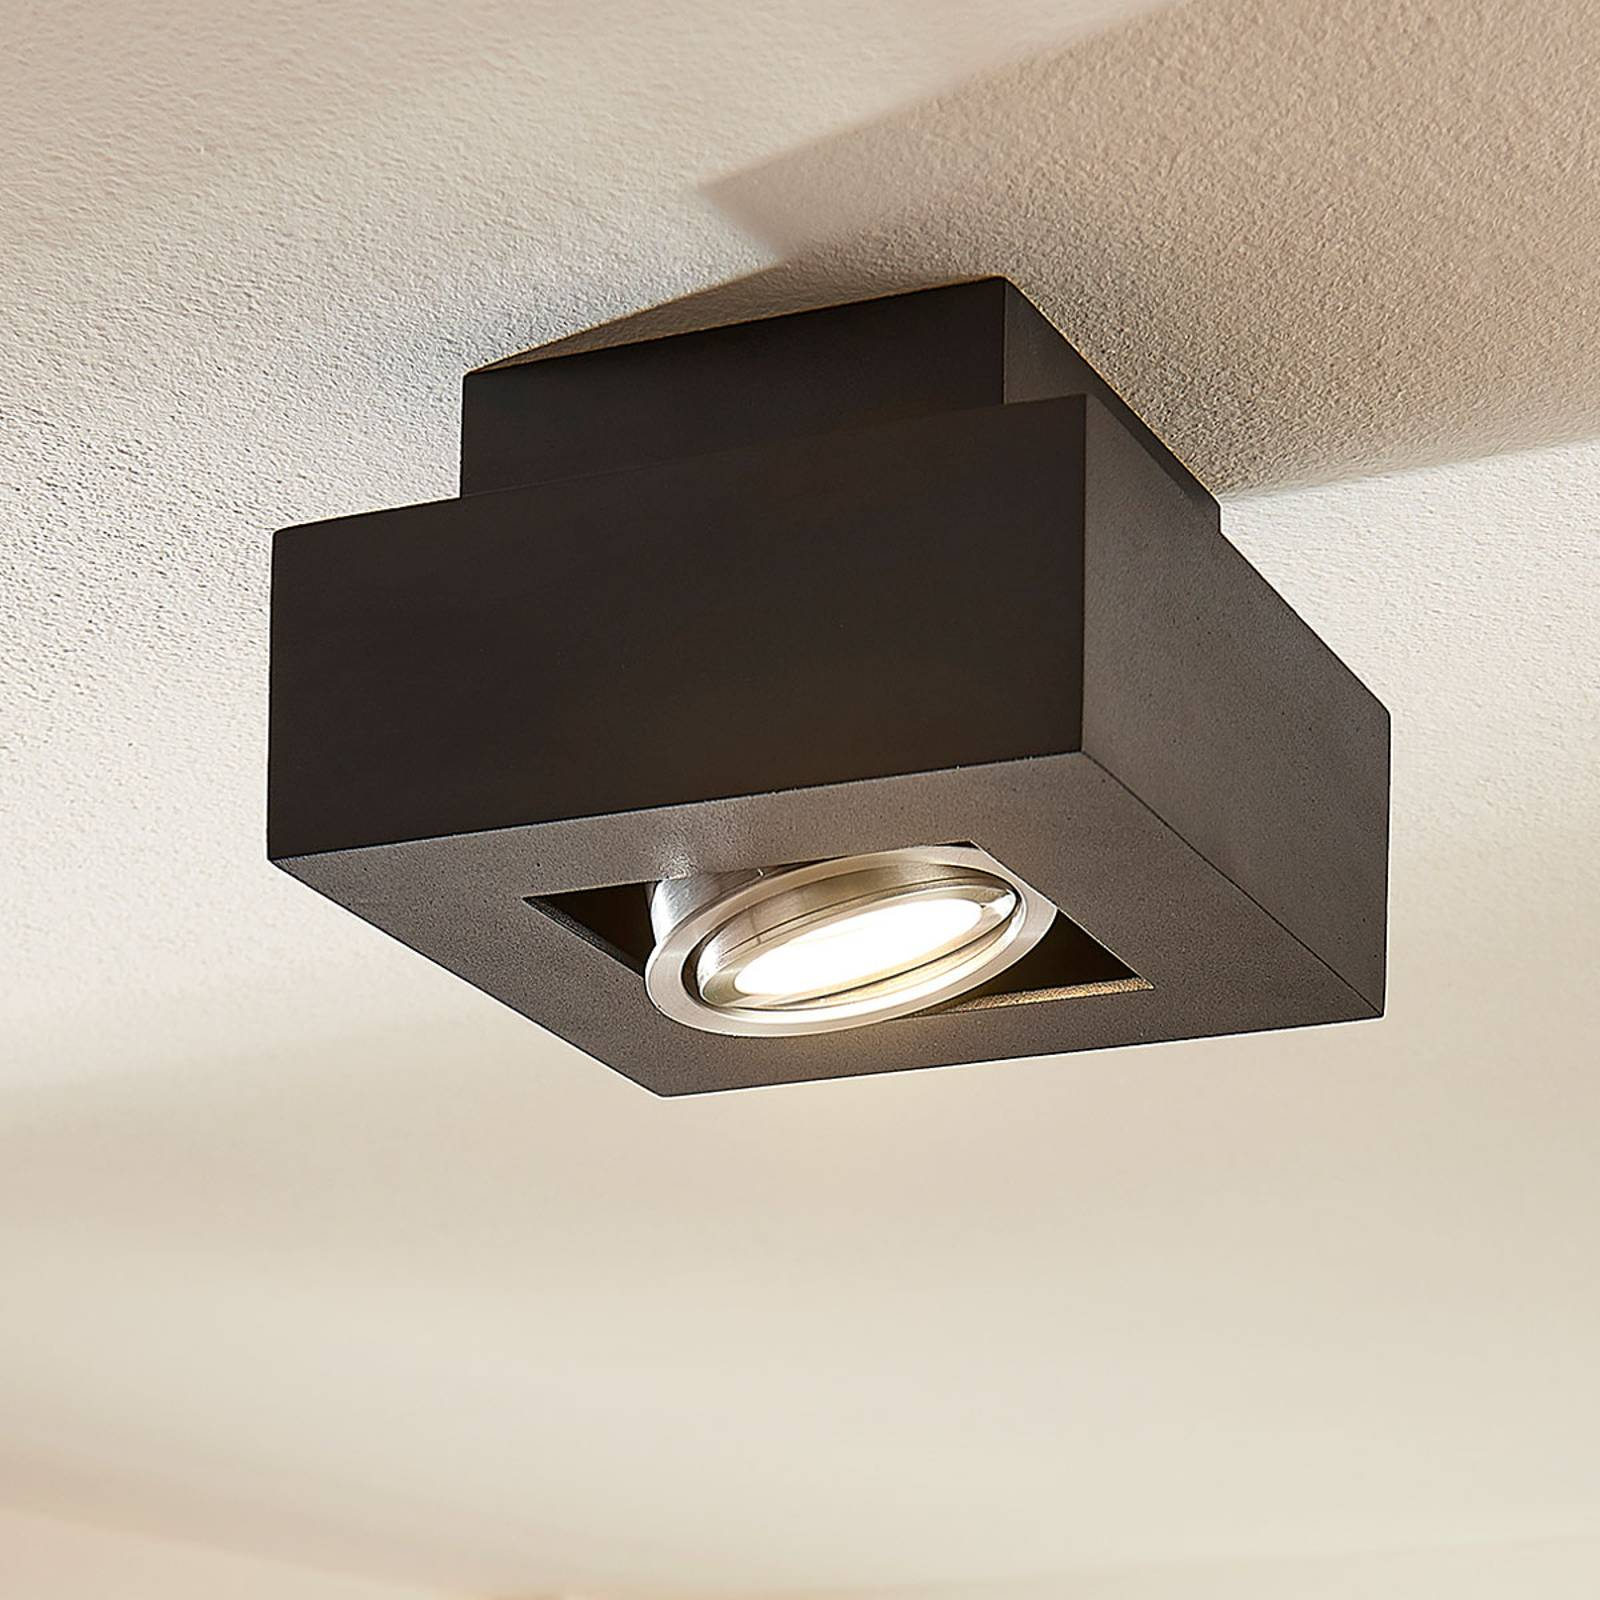 LED-kattolamppu Vince, 14 x 14 cm musta